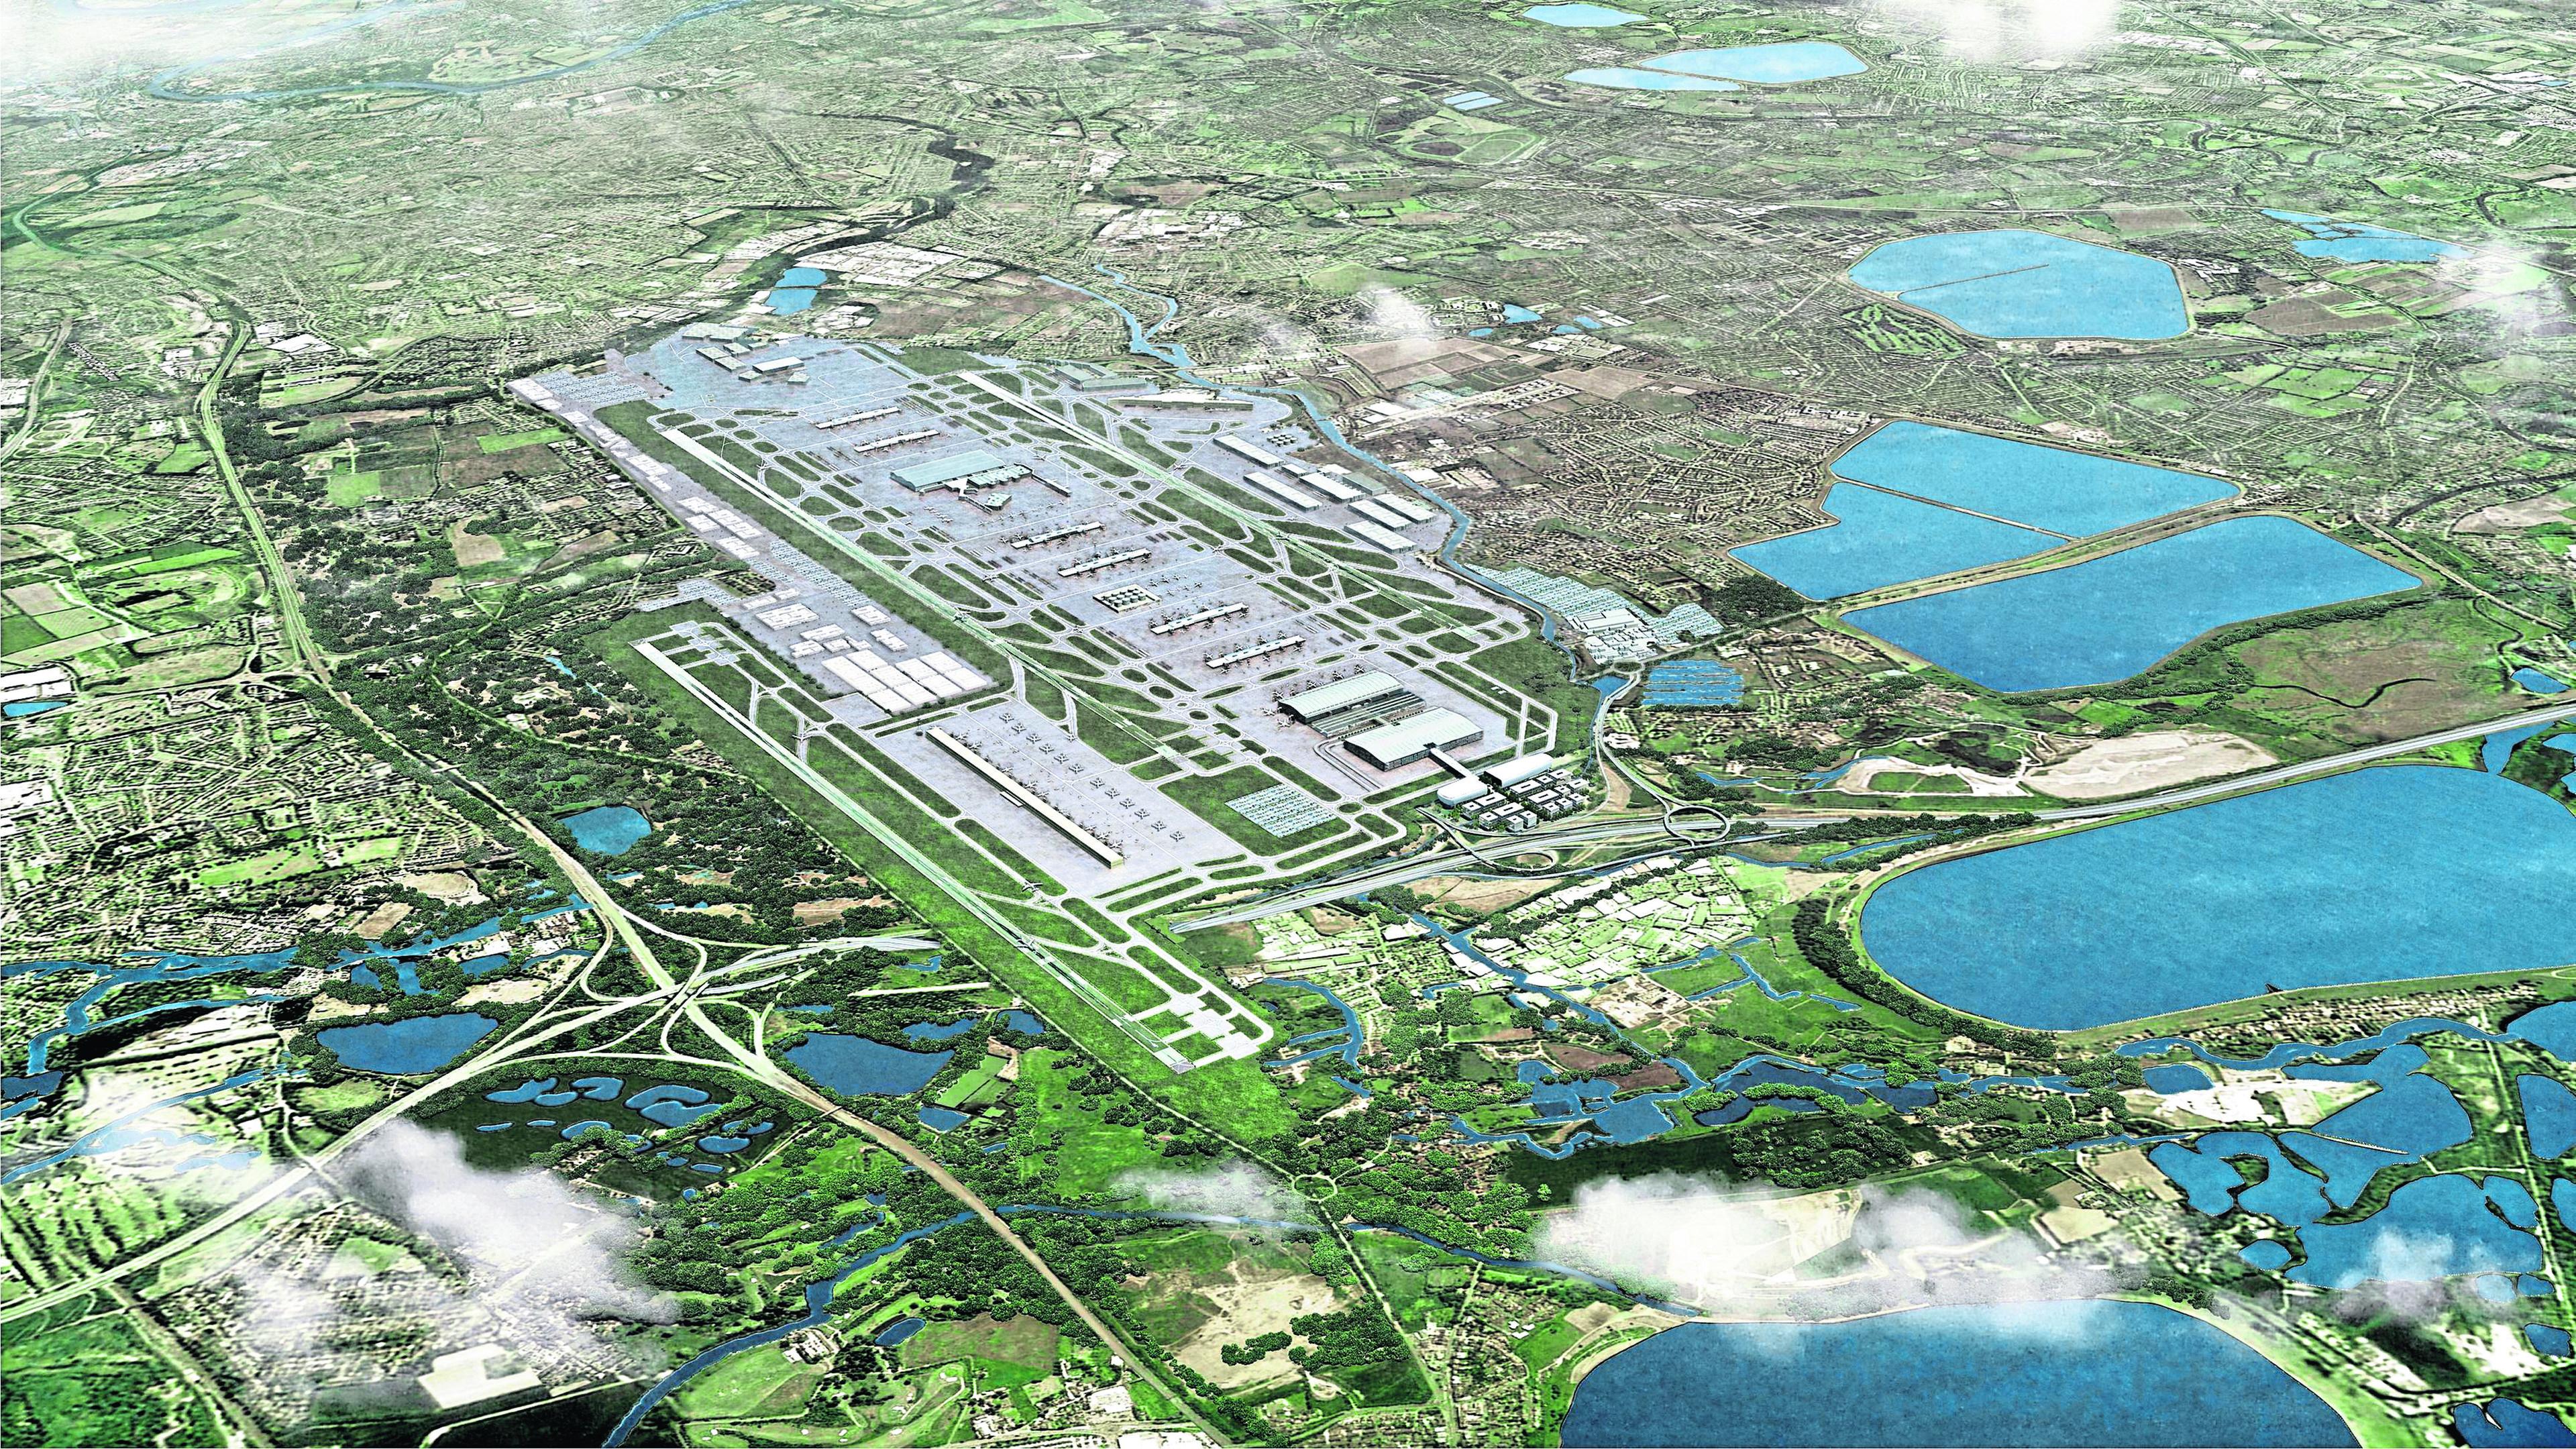 Artist's impression of Heathrow's third runway